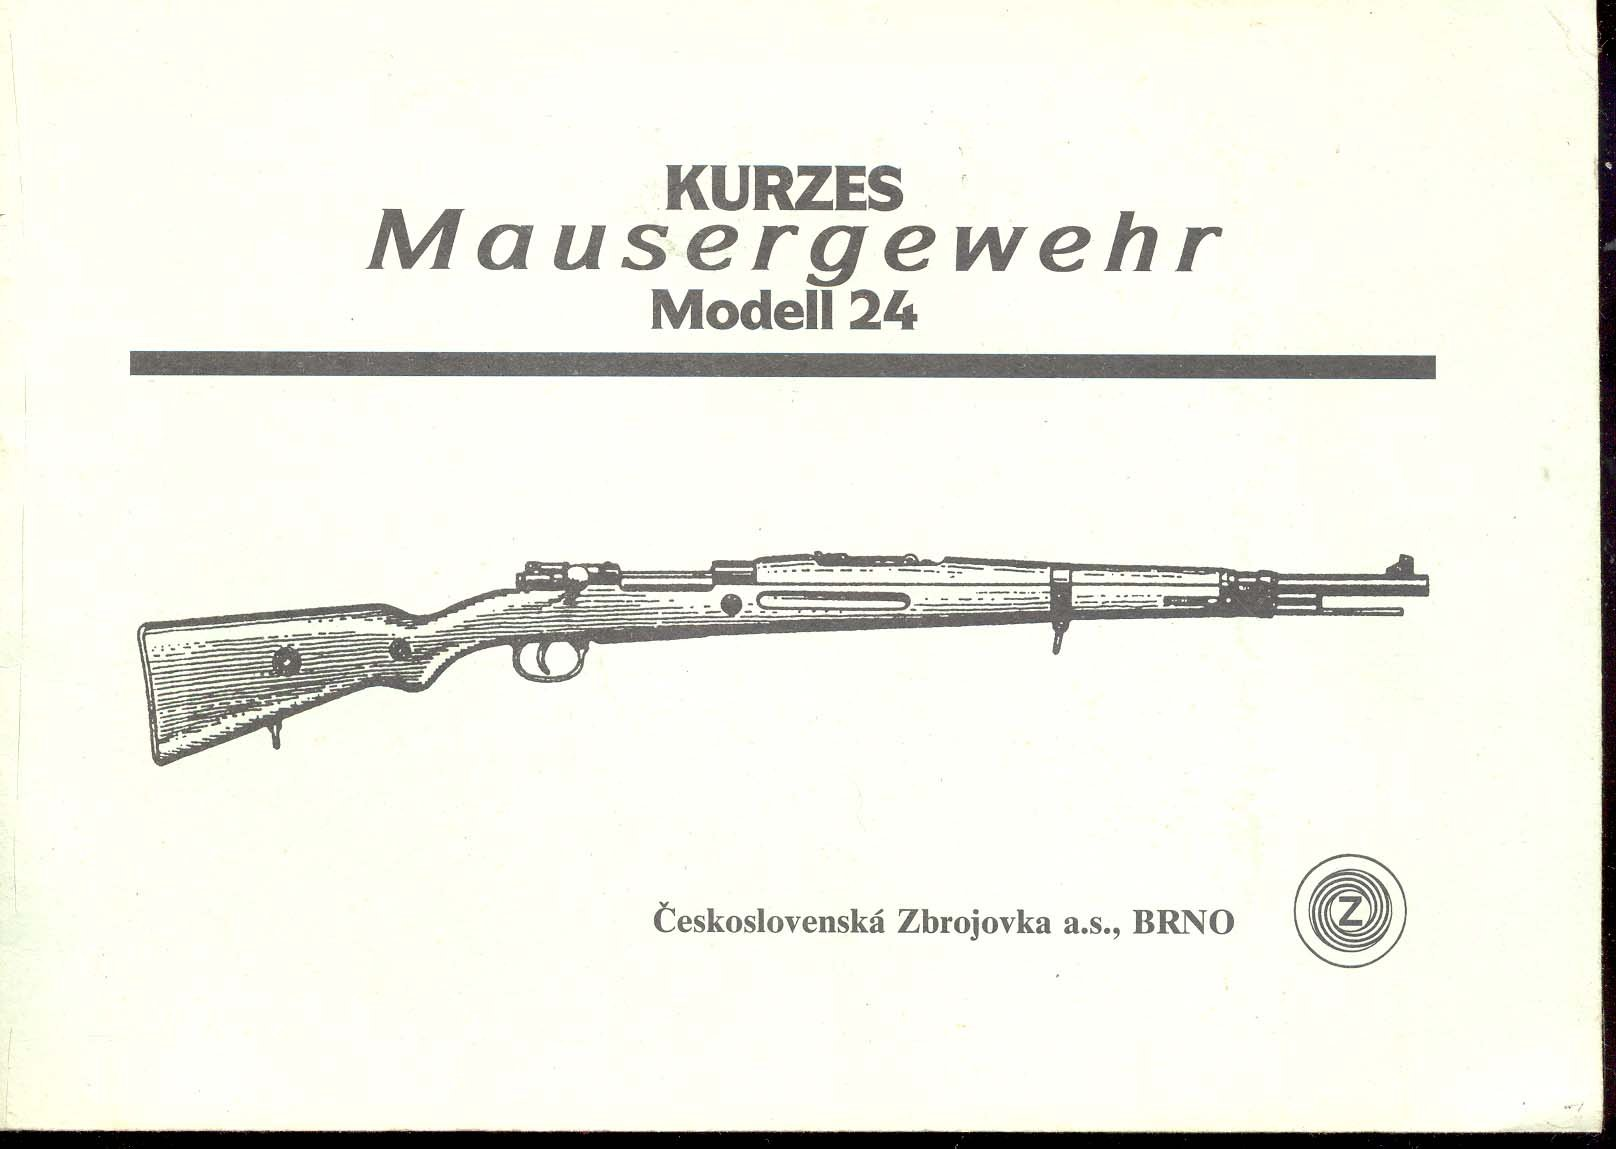 Kurzes Mausergewehr Modell 24: BRNO: Amazon com: Books